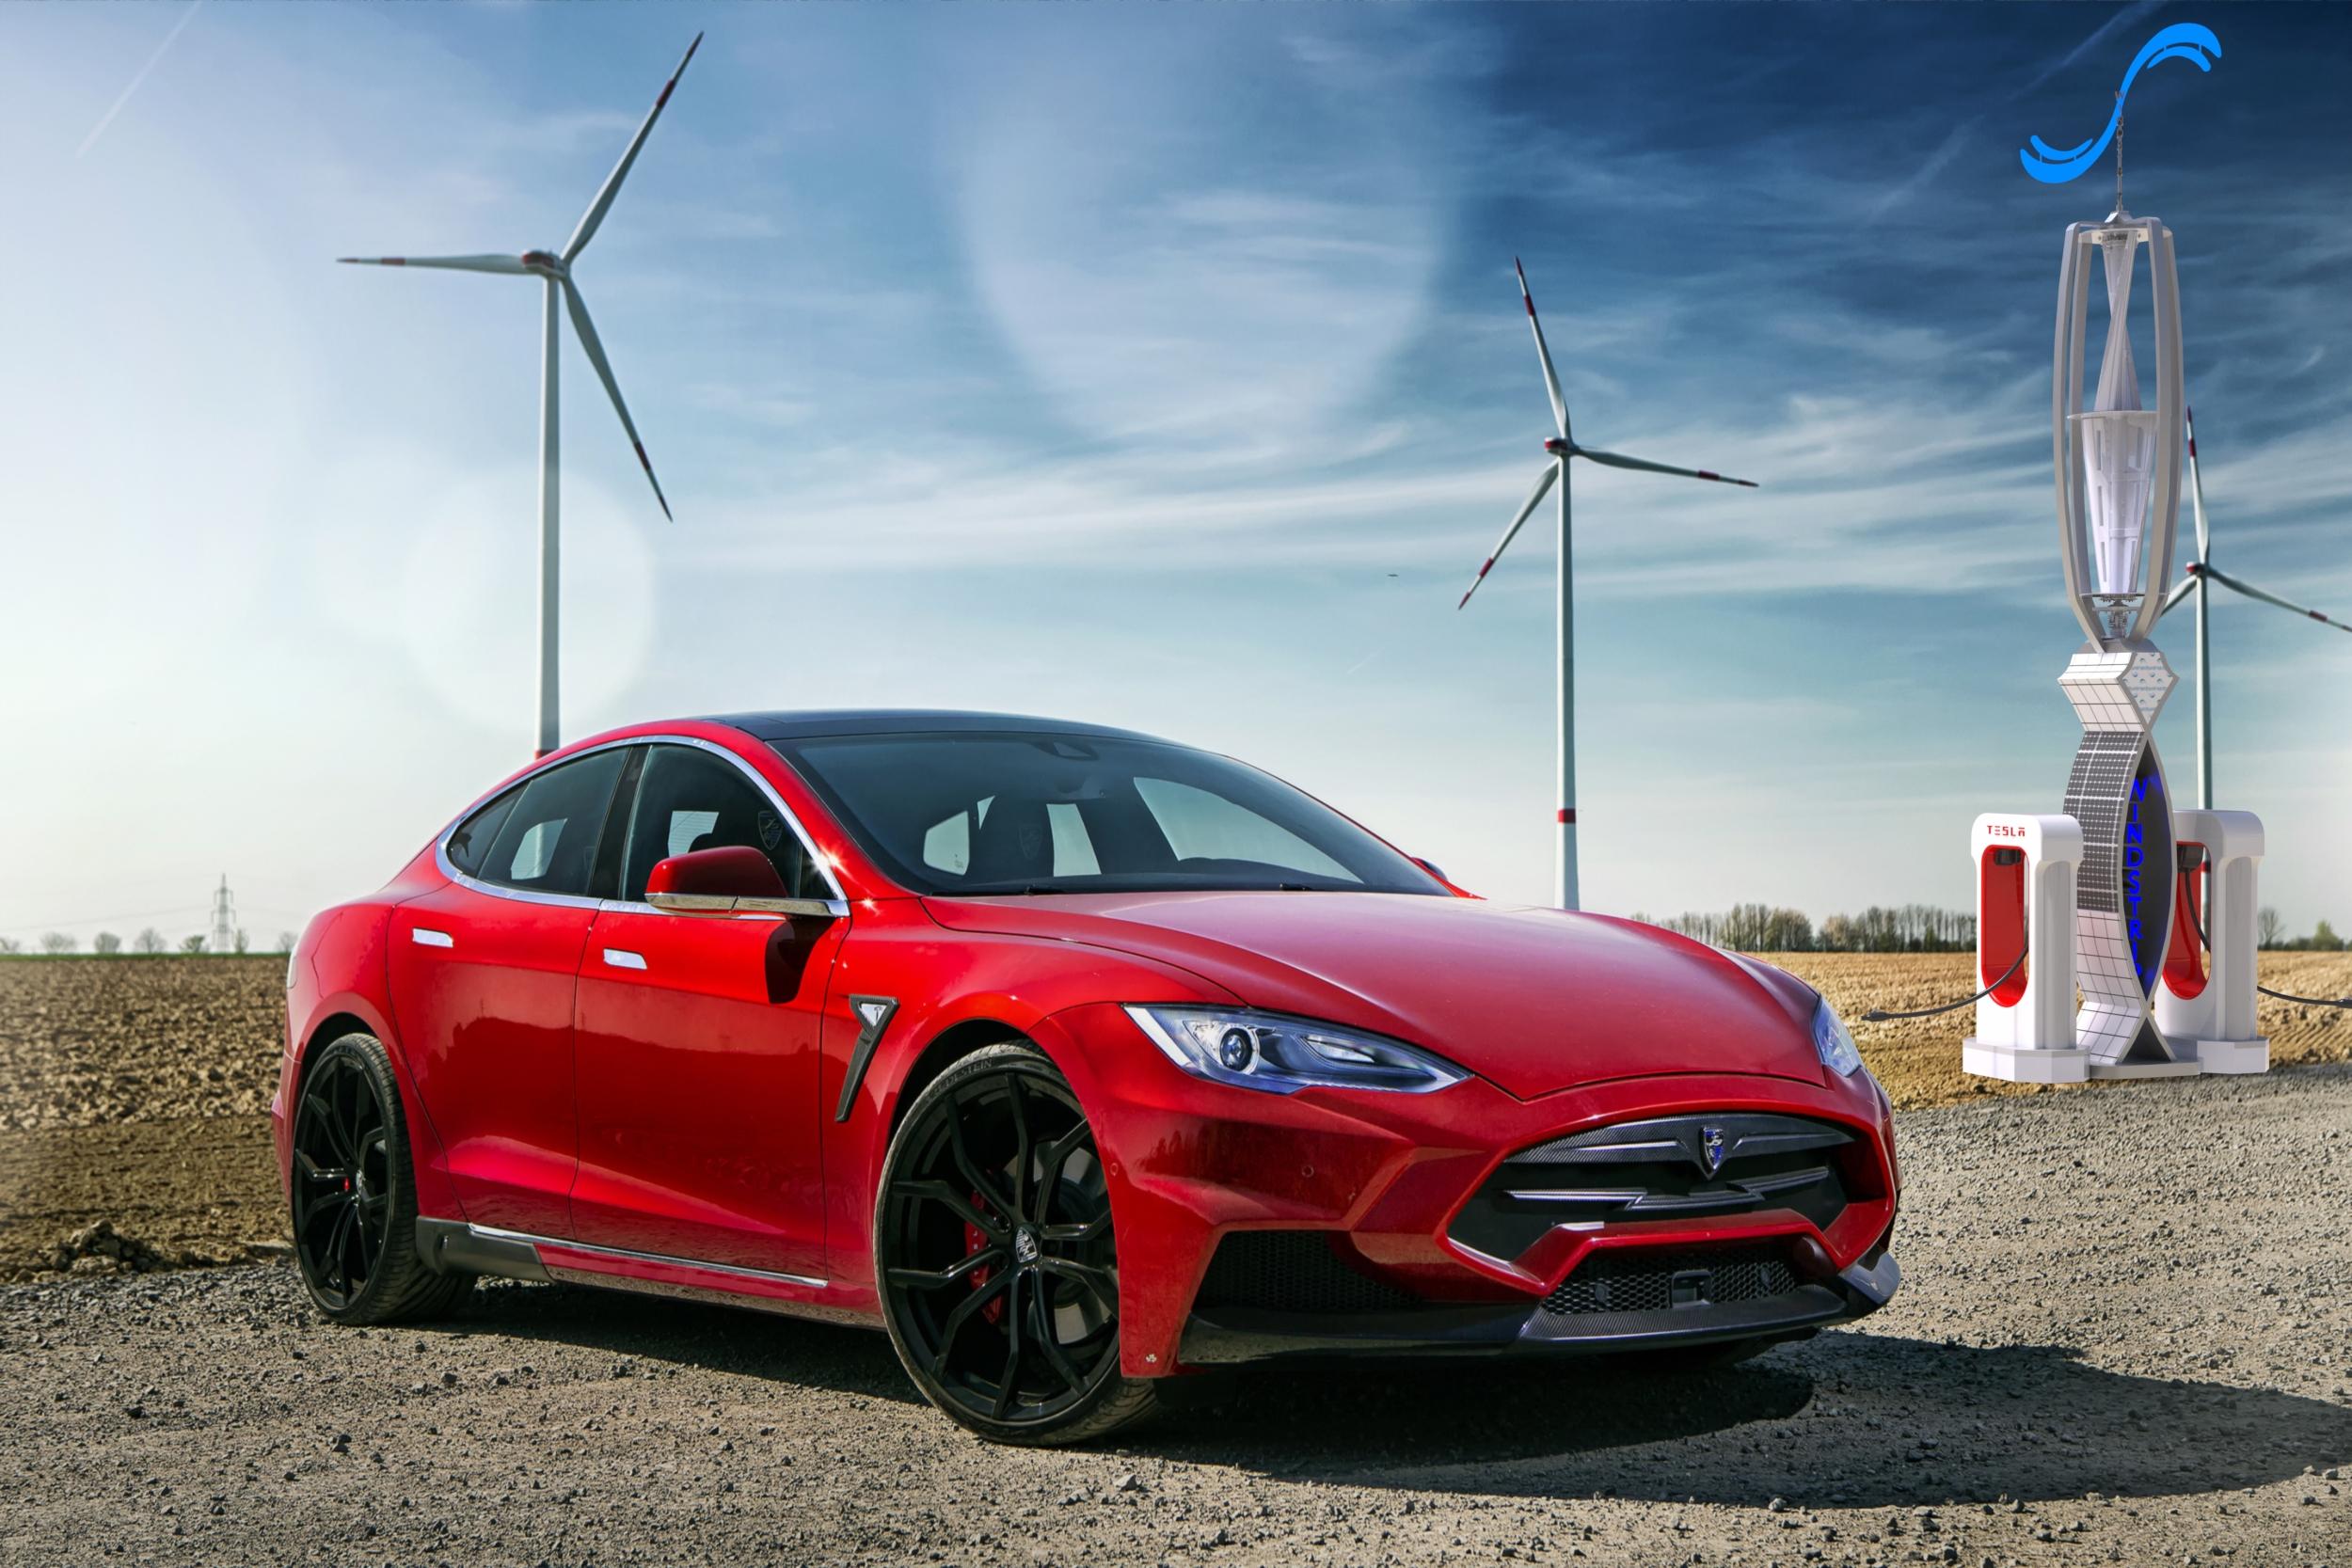 2-Generic Tesla Tower Superchargers Model S.JPG